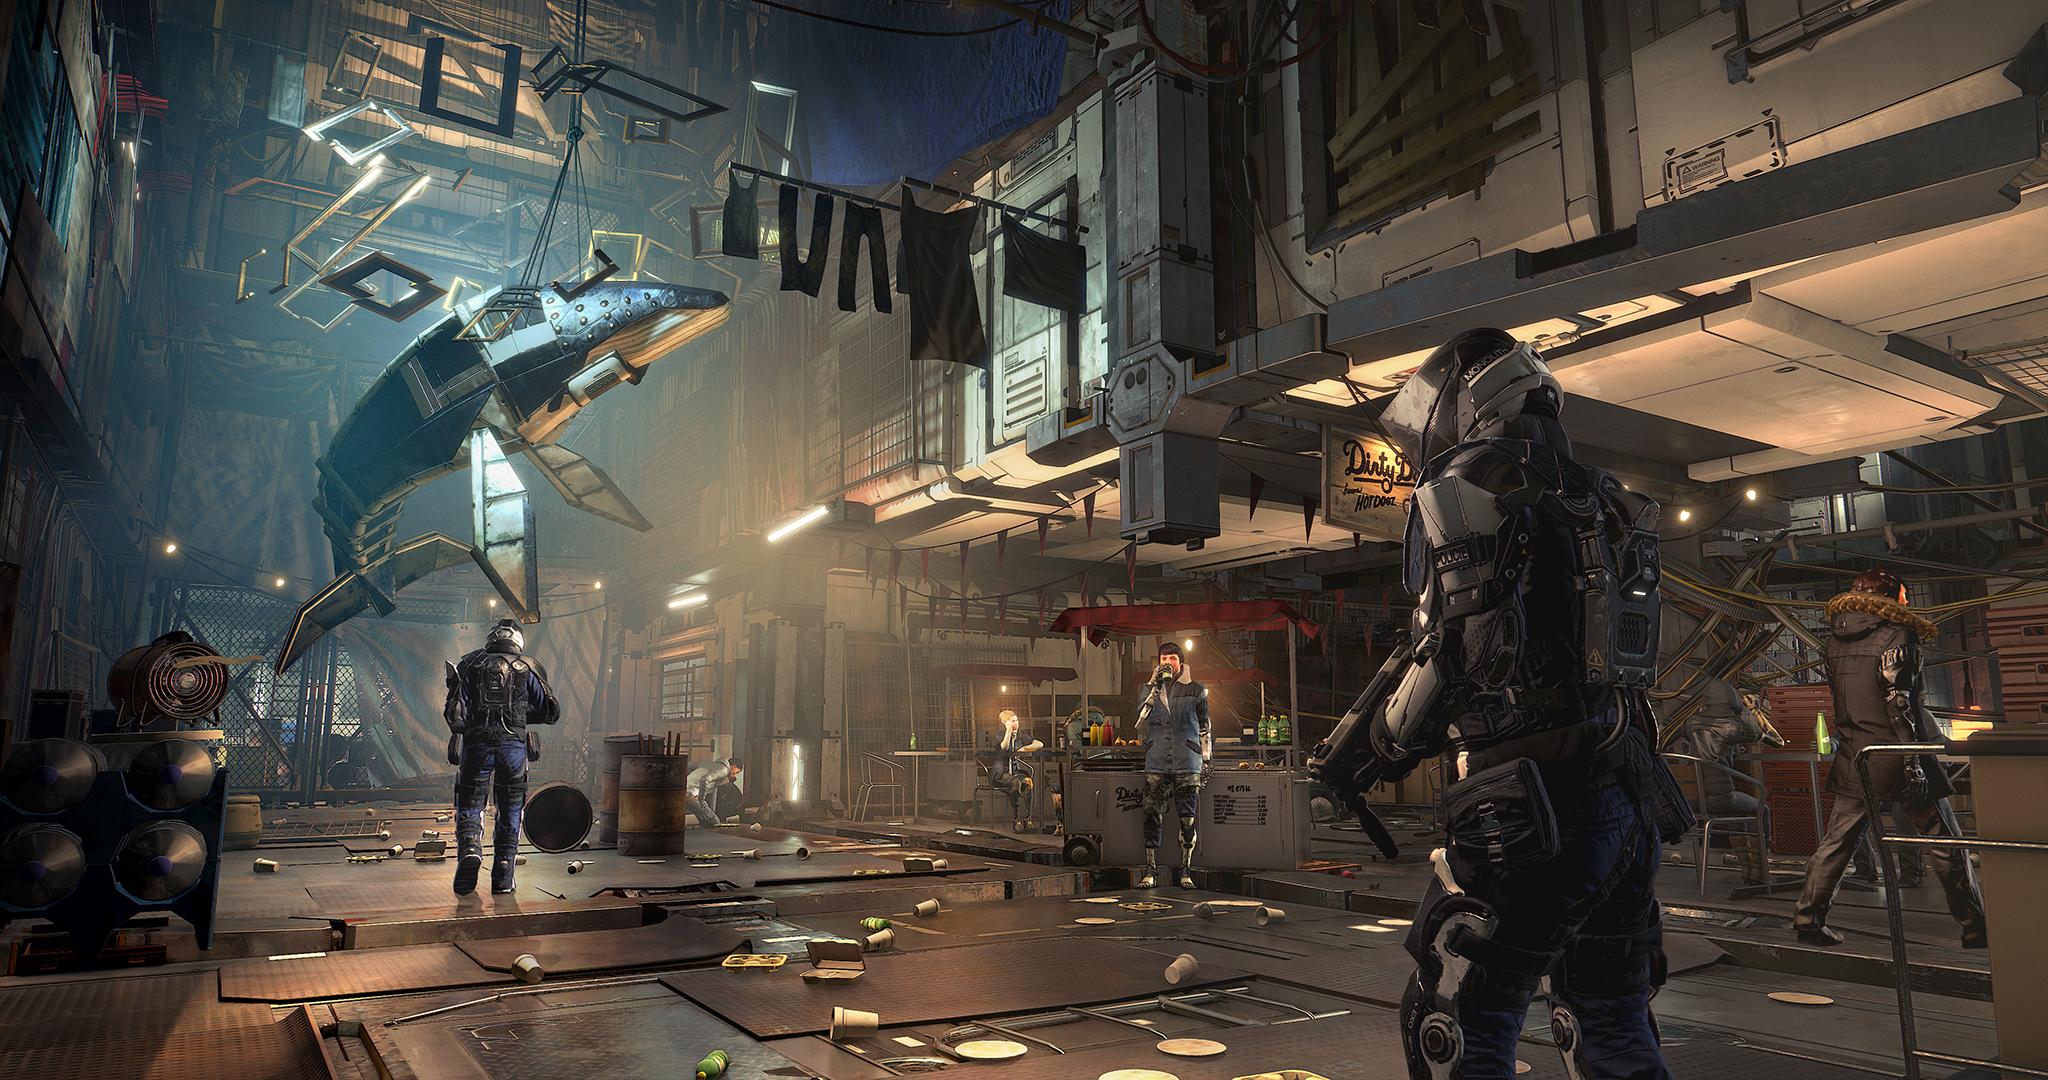 Deus Ex Mankind Divided Ps4 Pro Vs Pc 4k Screenshot Comparison